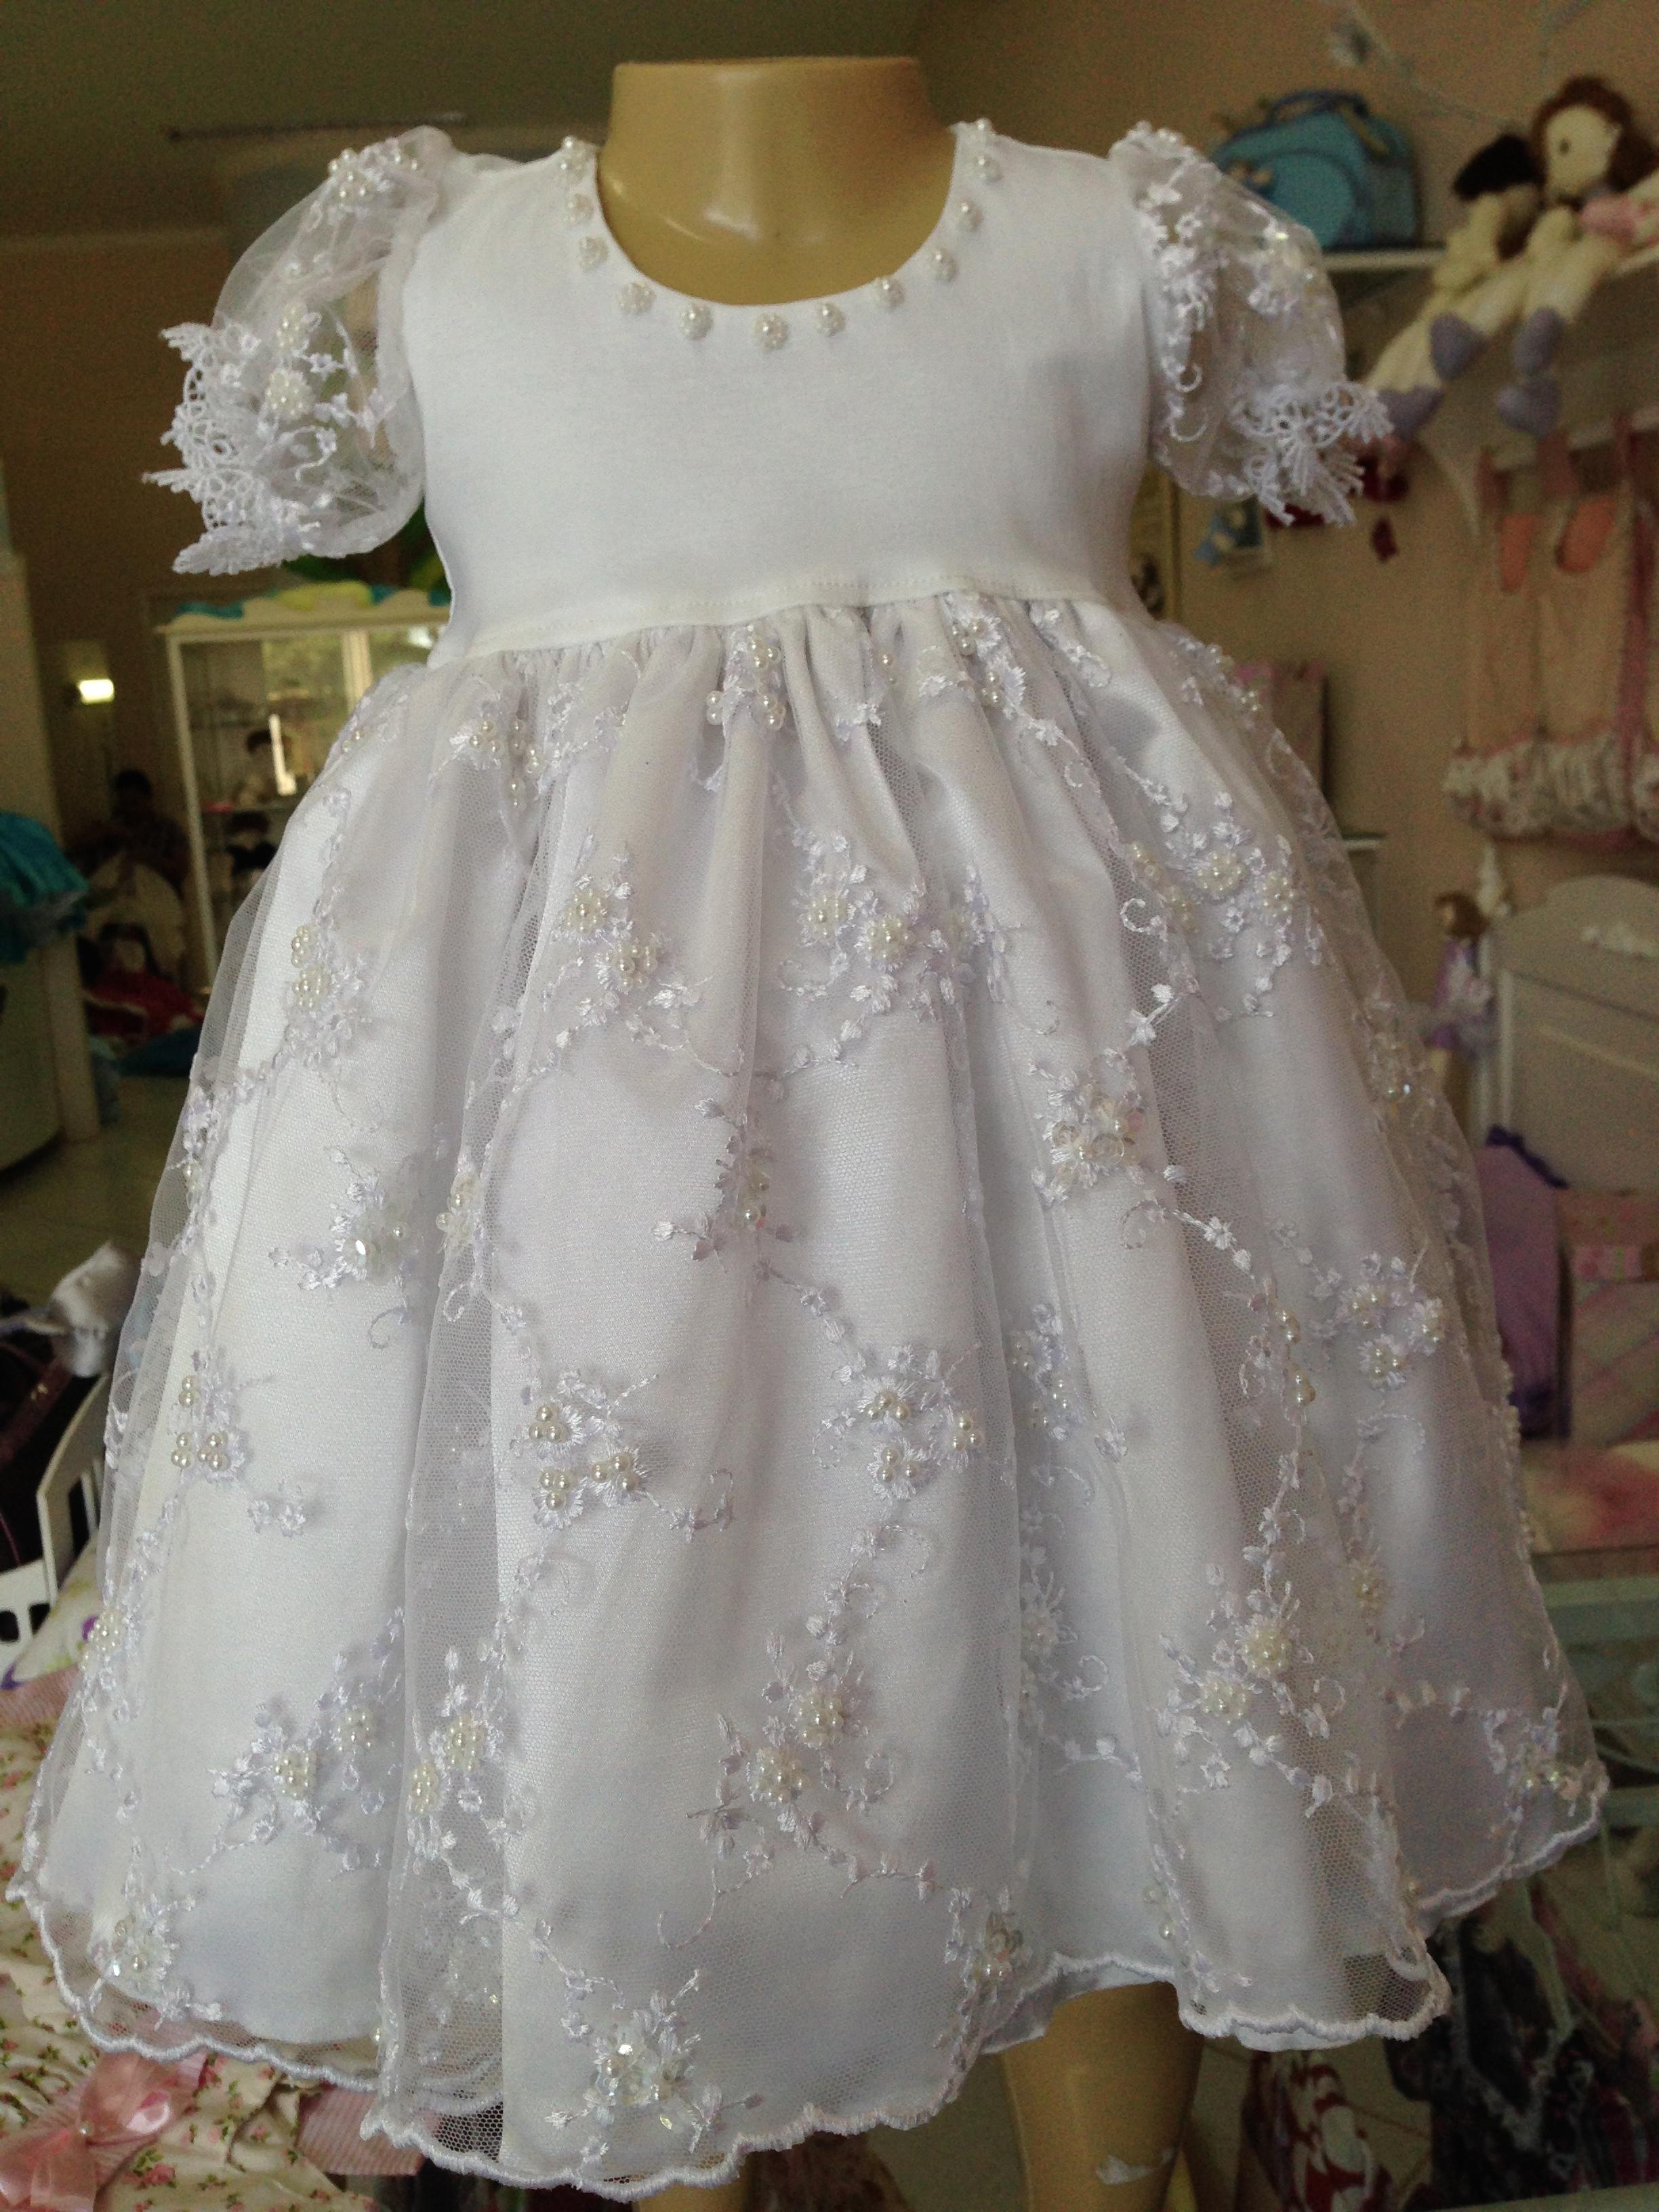 Vestido batizado super luxo renda guipir dalili store baby elo7 - Bebe ontwerp ...